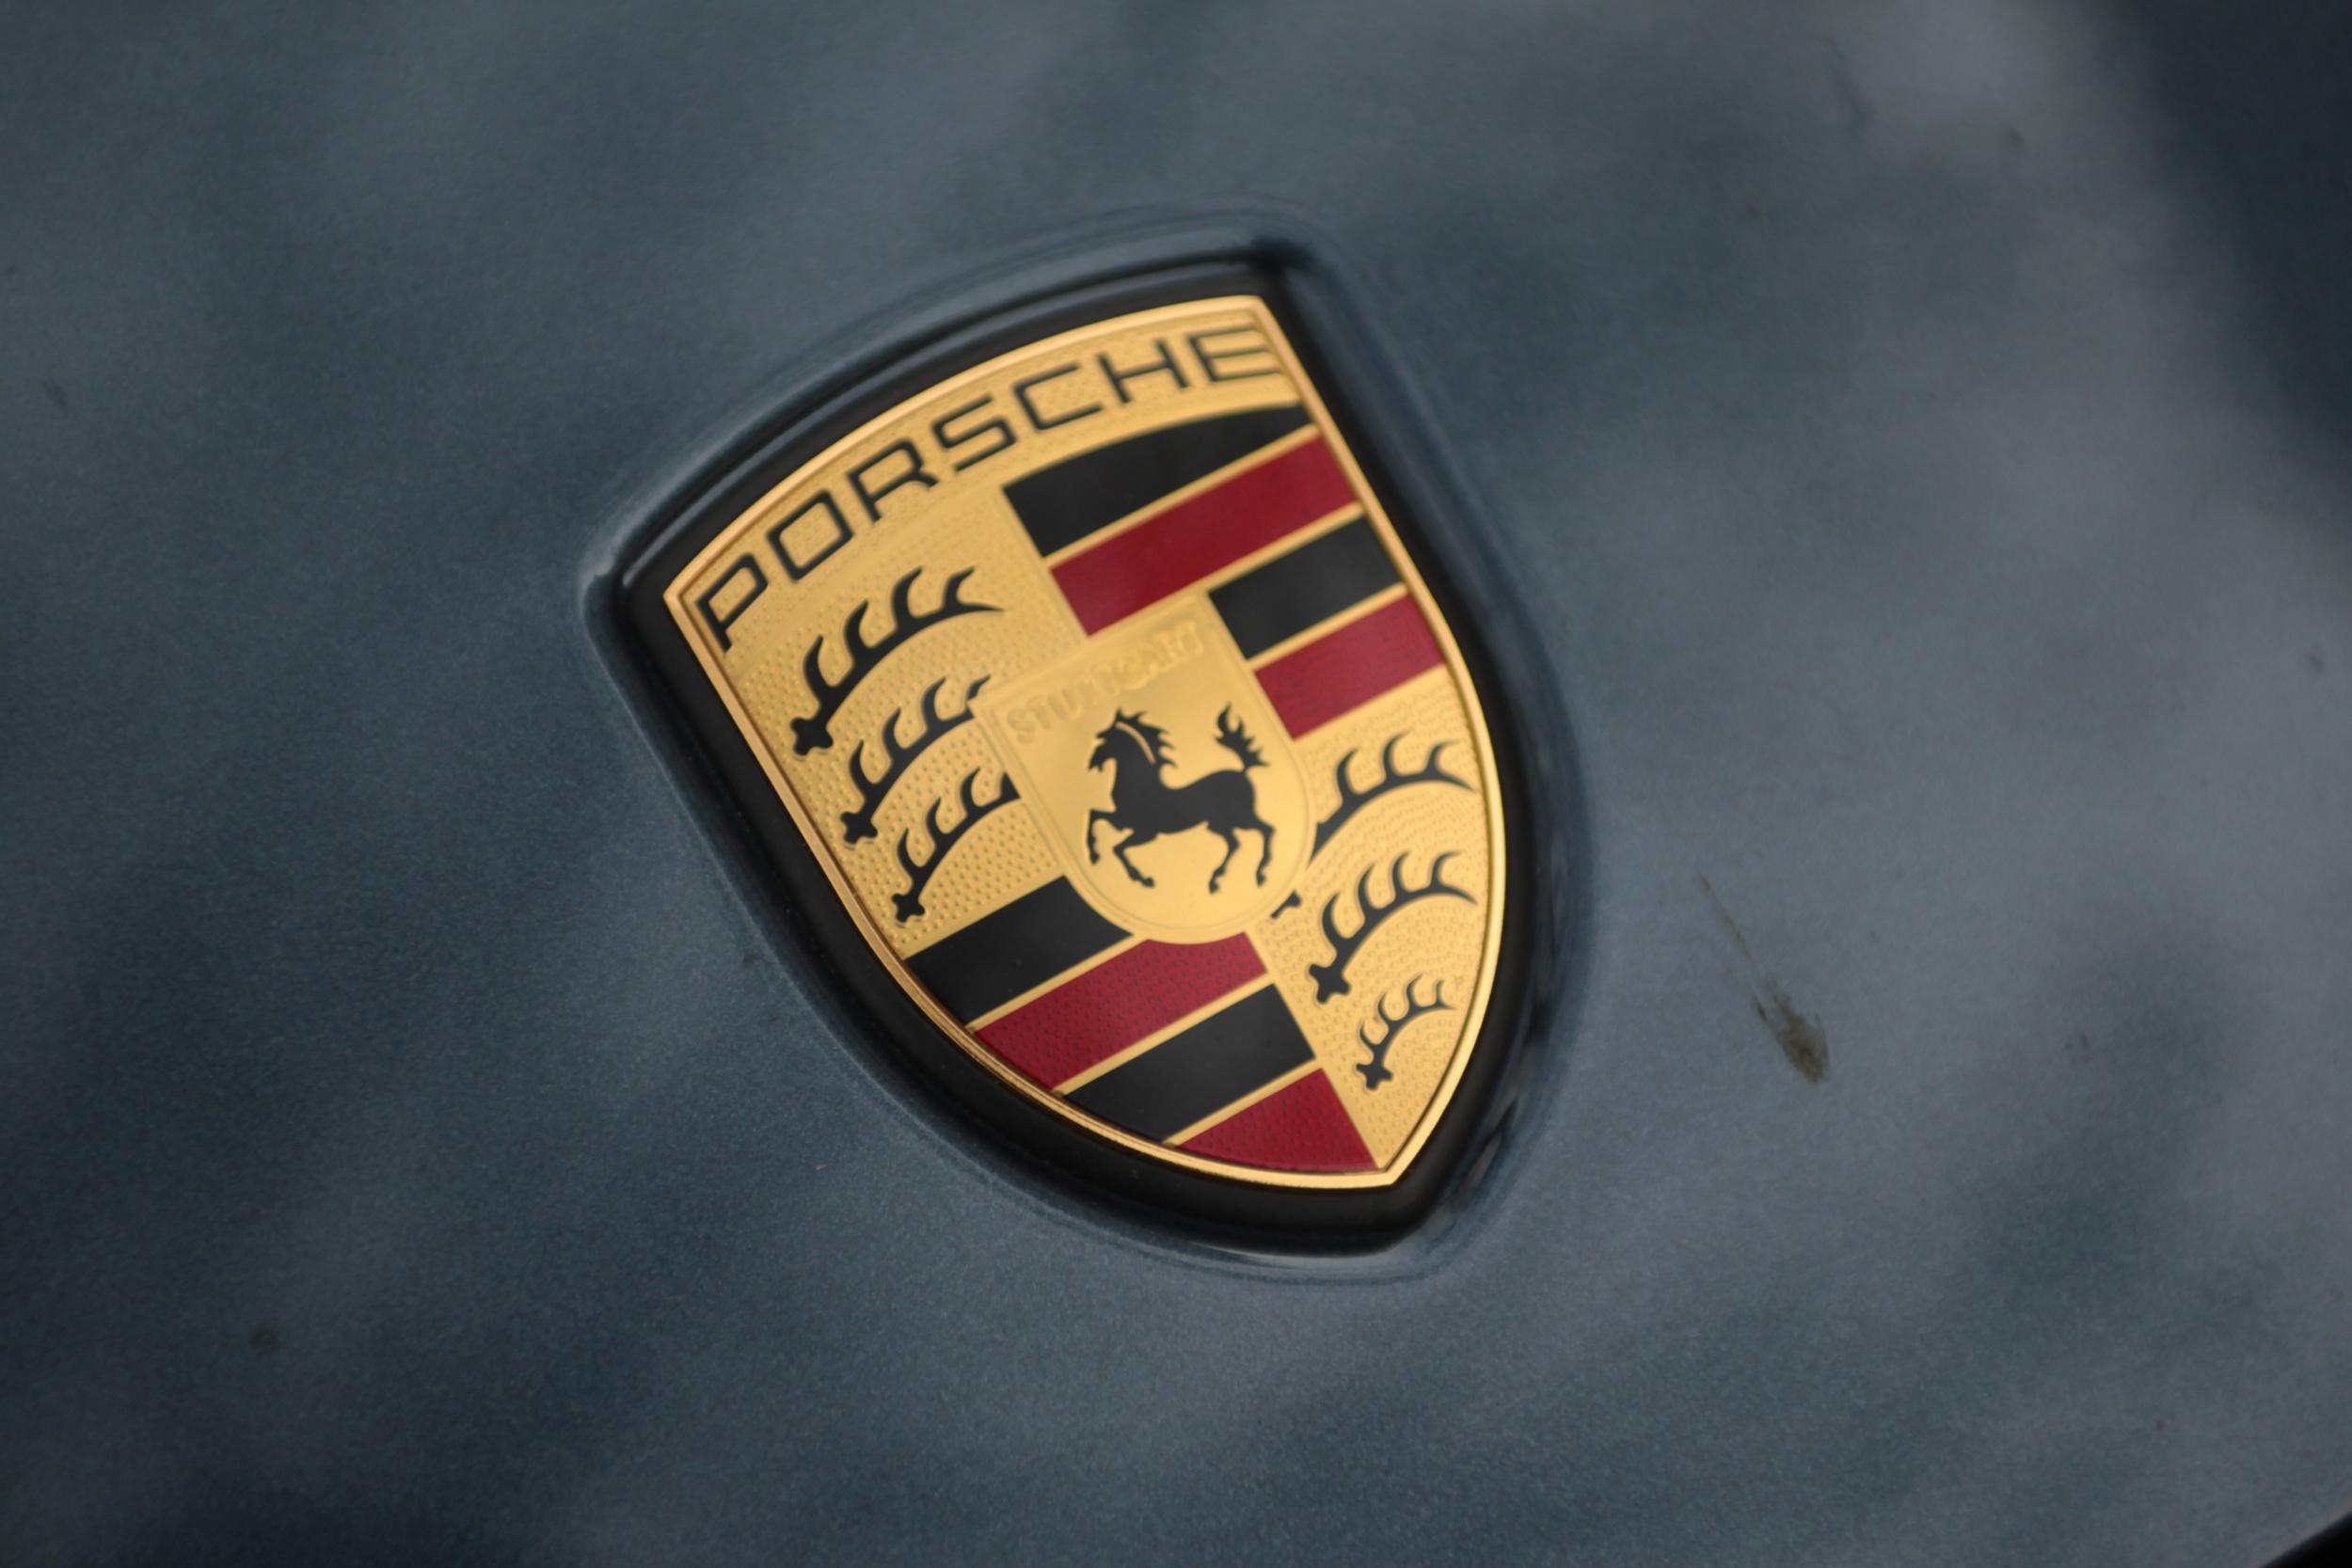 48+ Porsche Logo Wallpaper on WallpaperSafari